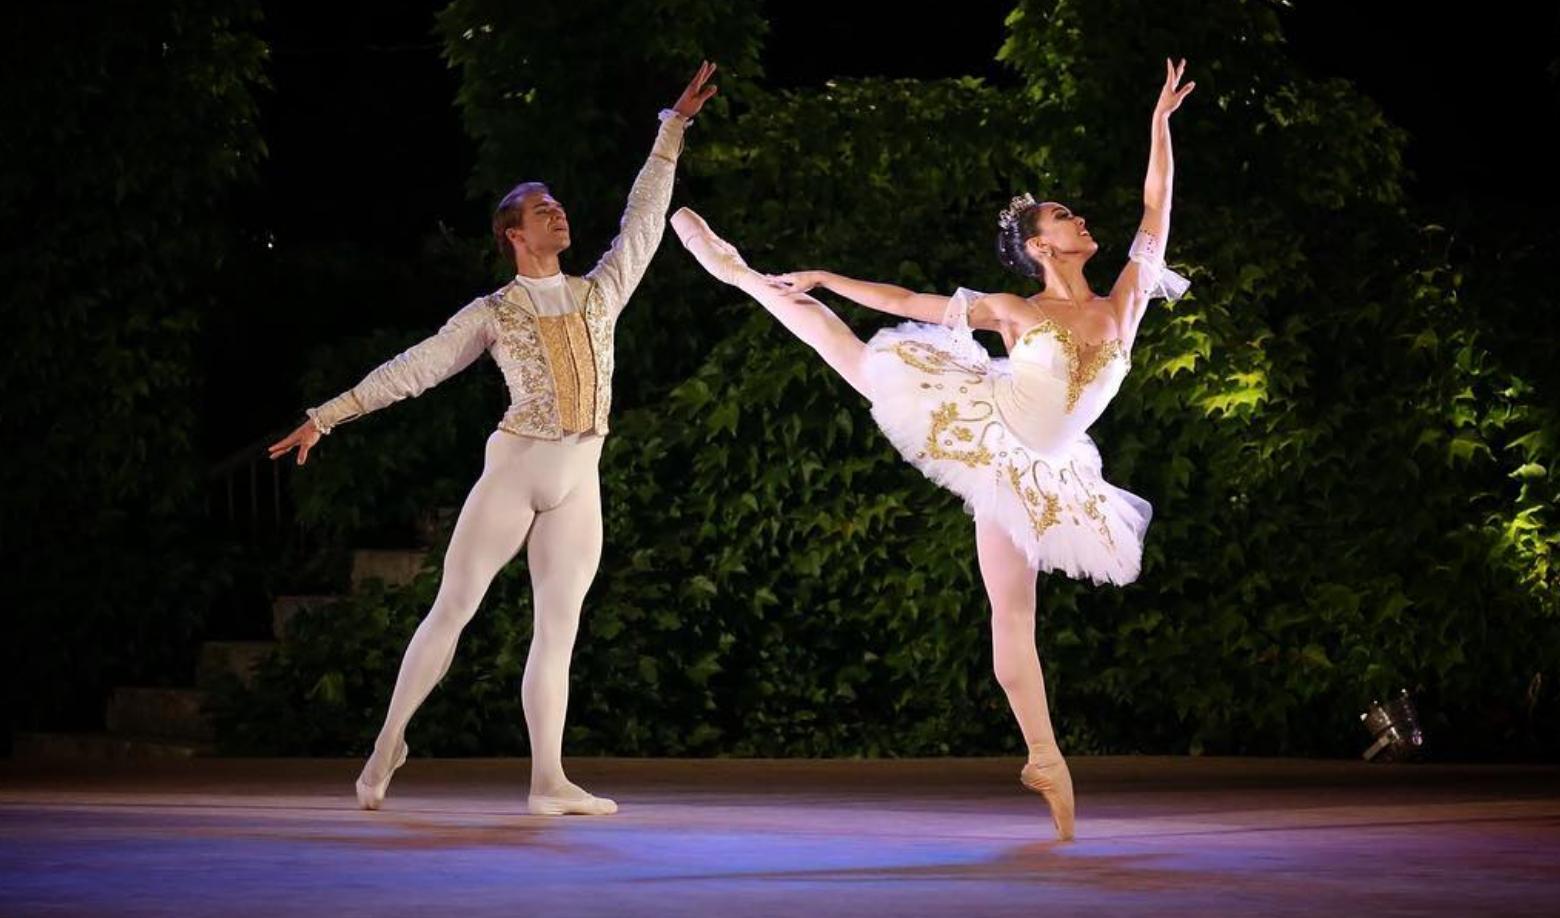 Comunicado Oficial - Solistas do balé